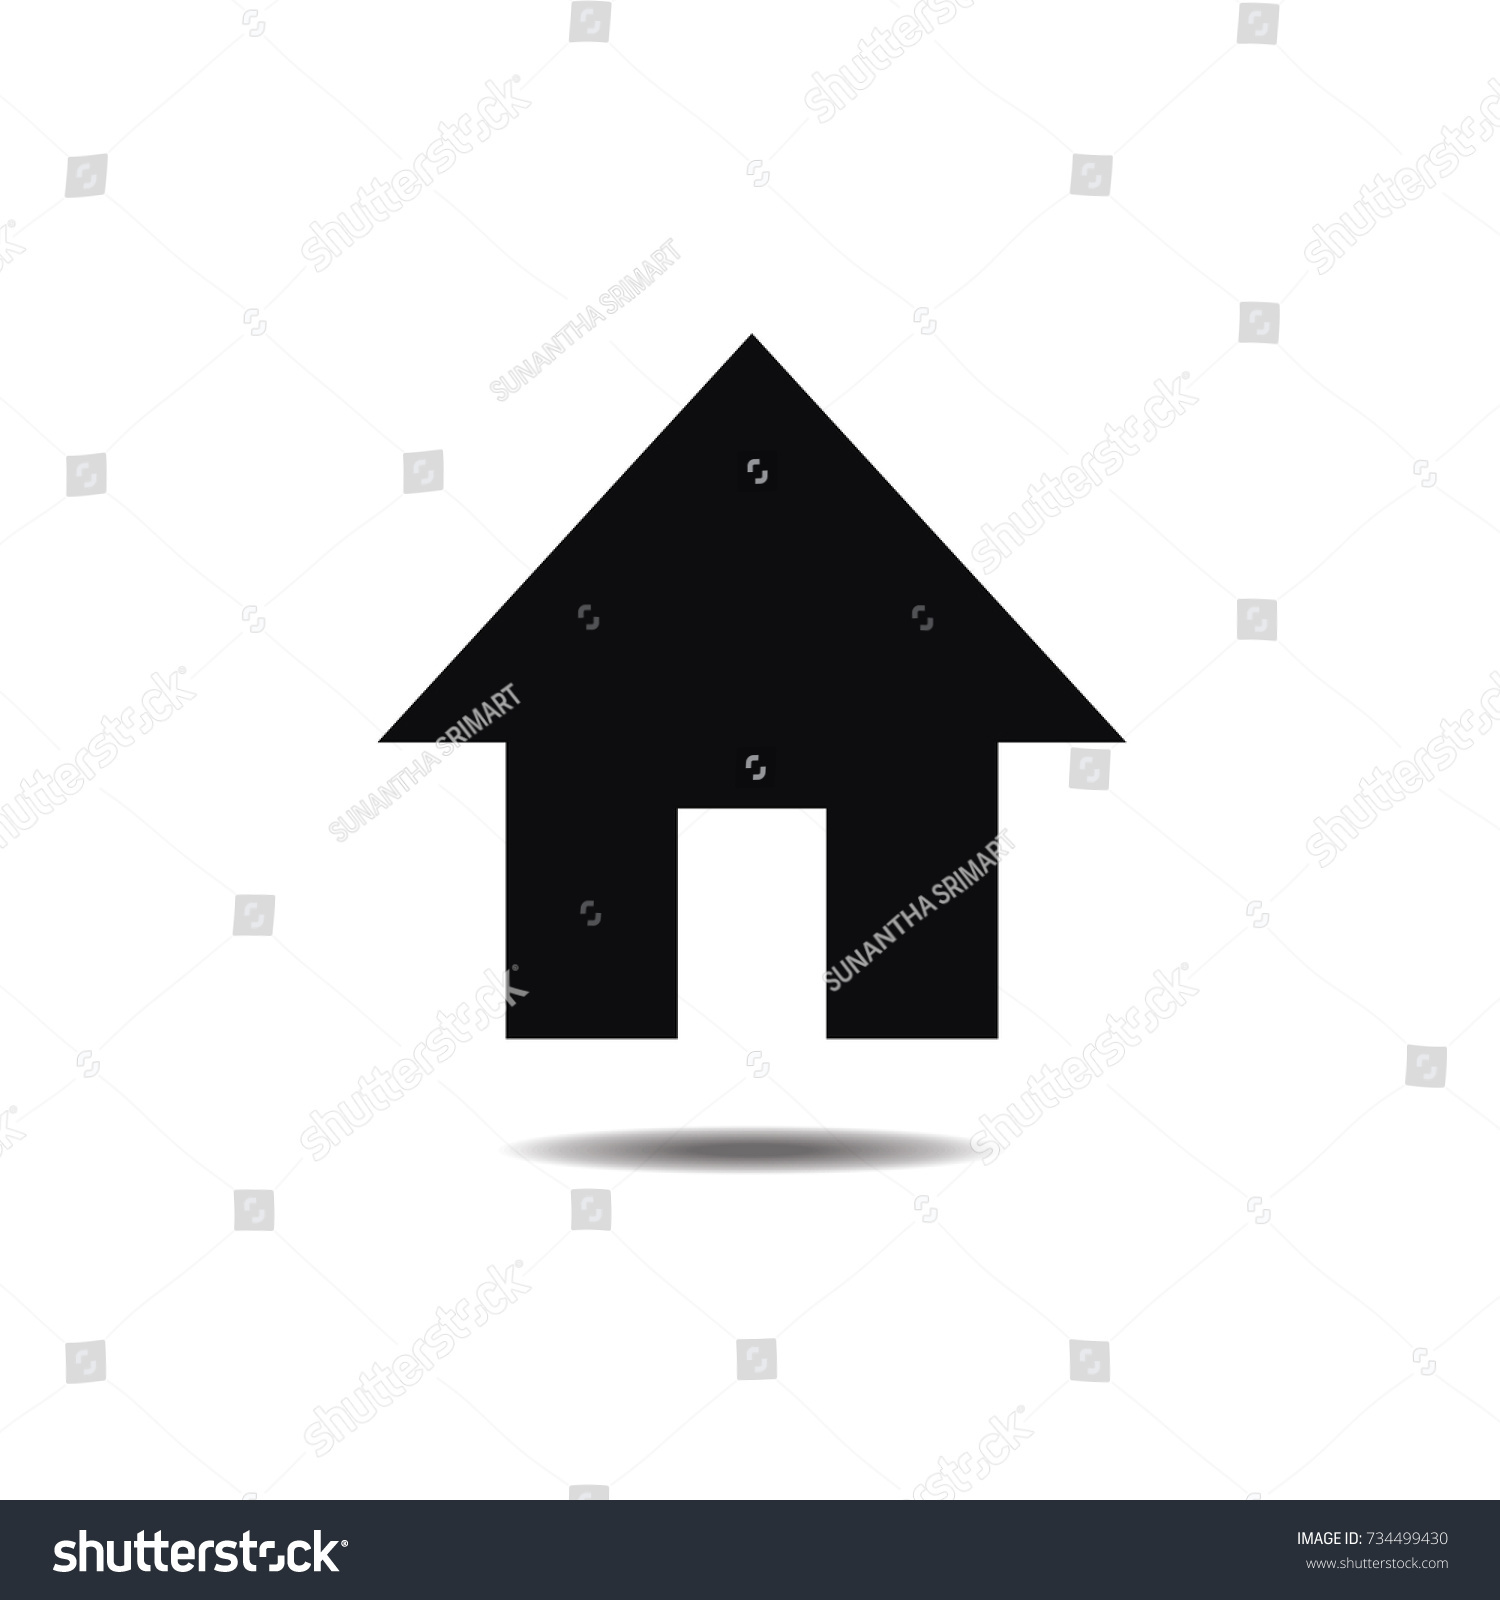 Home Icon Simple Design On White Stock Vector 734499430 - Shutterstock